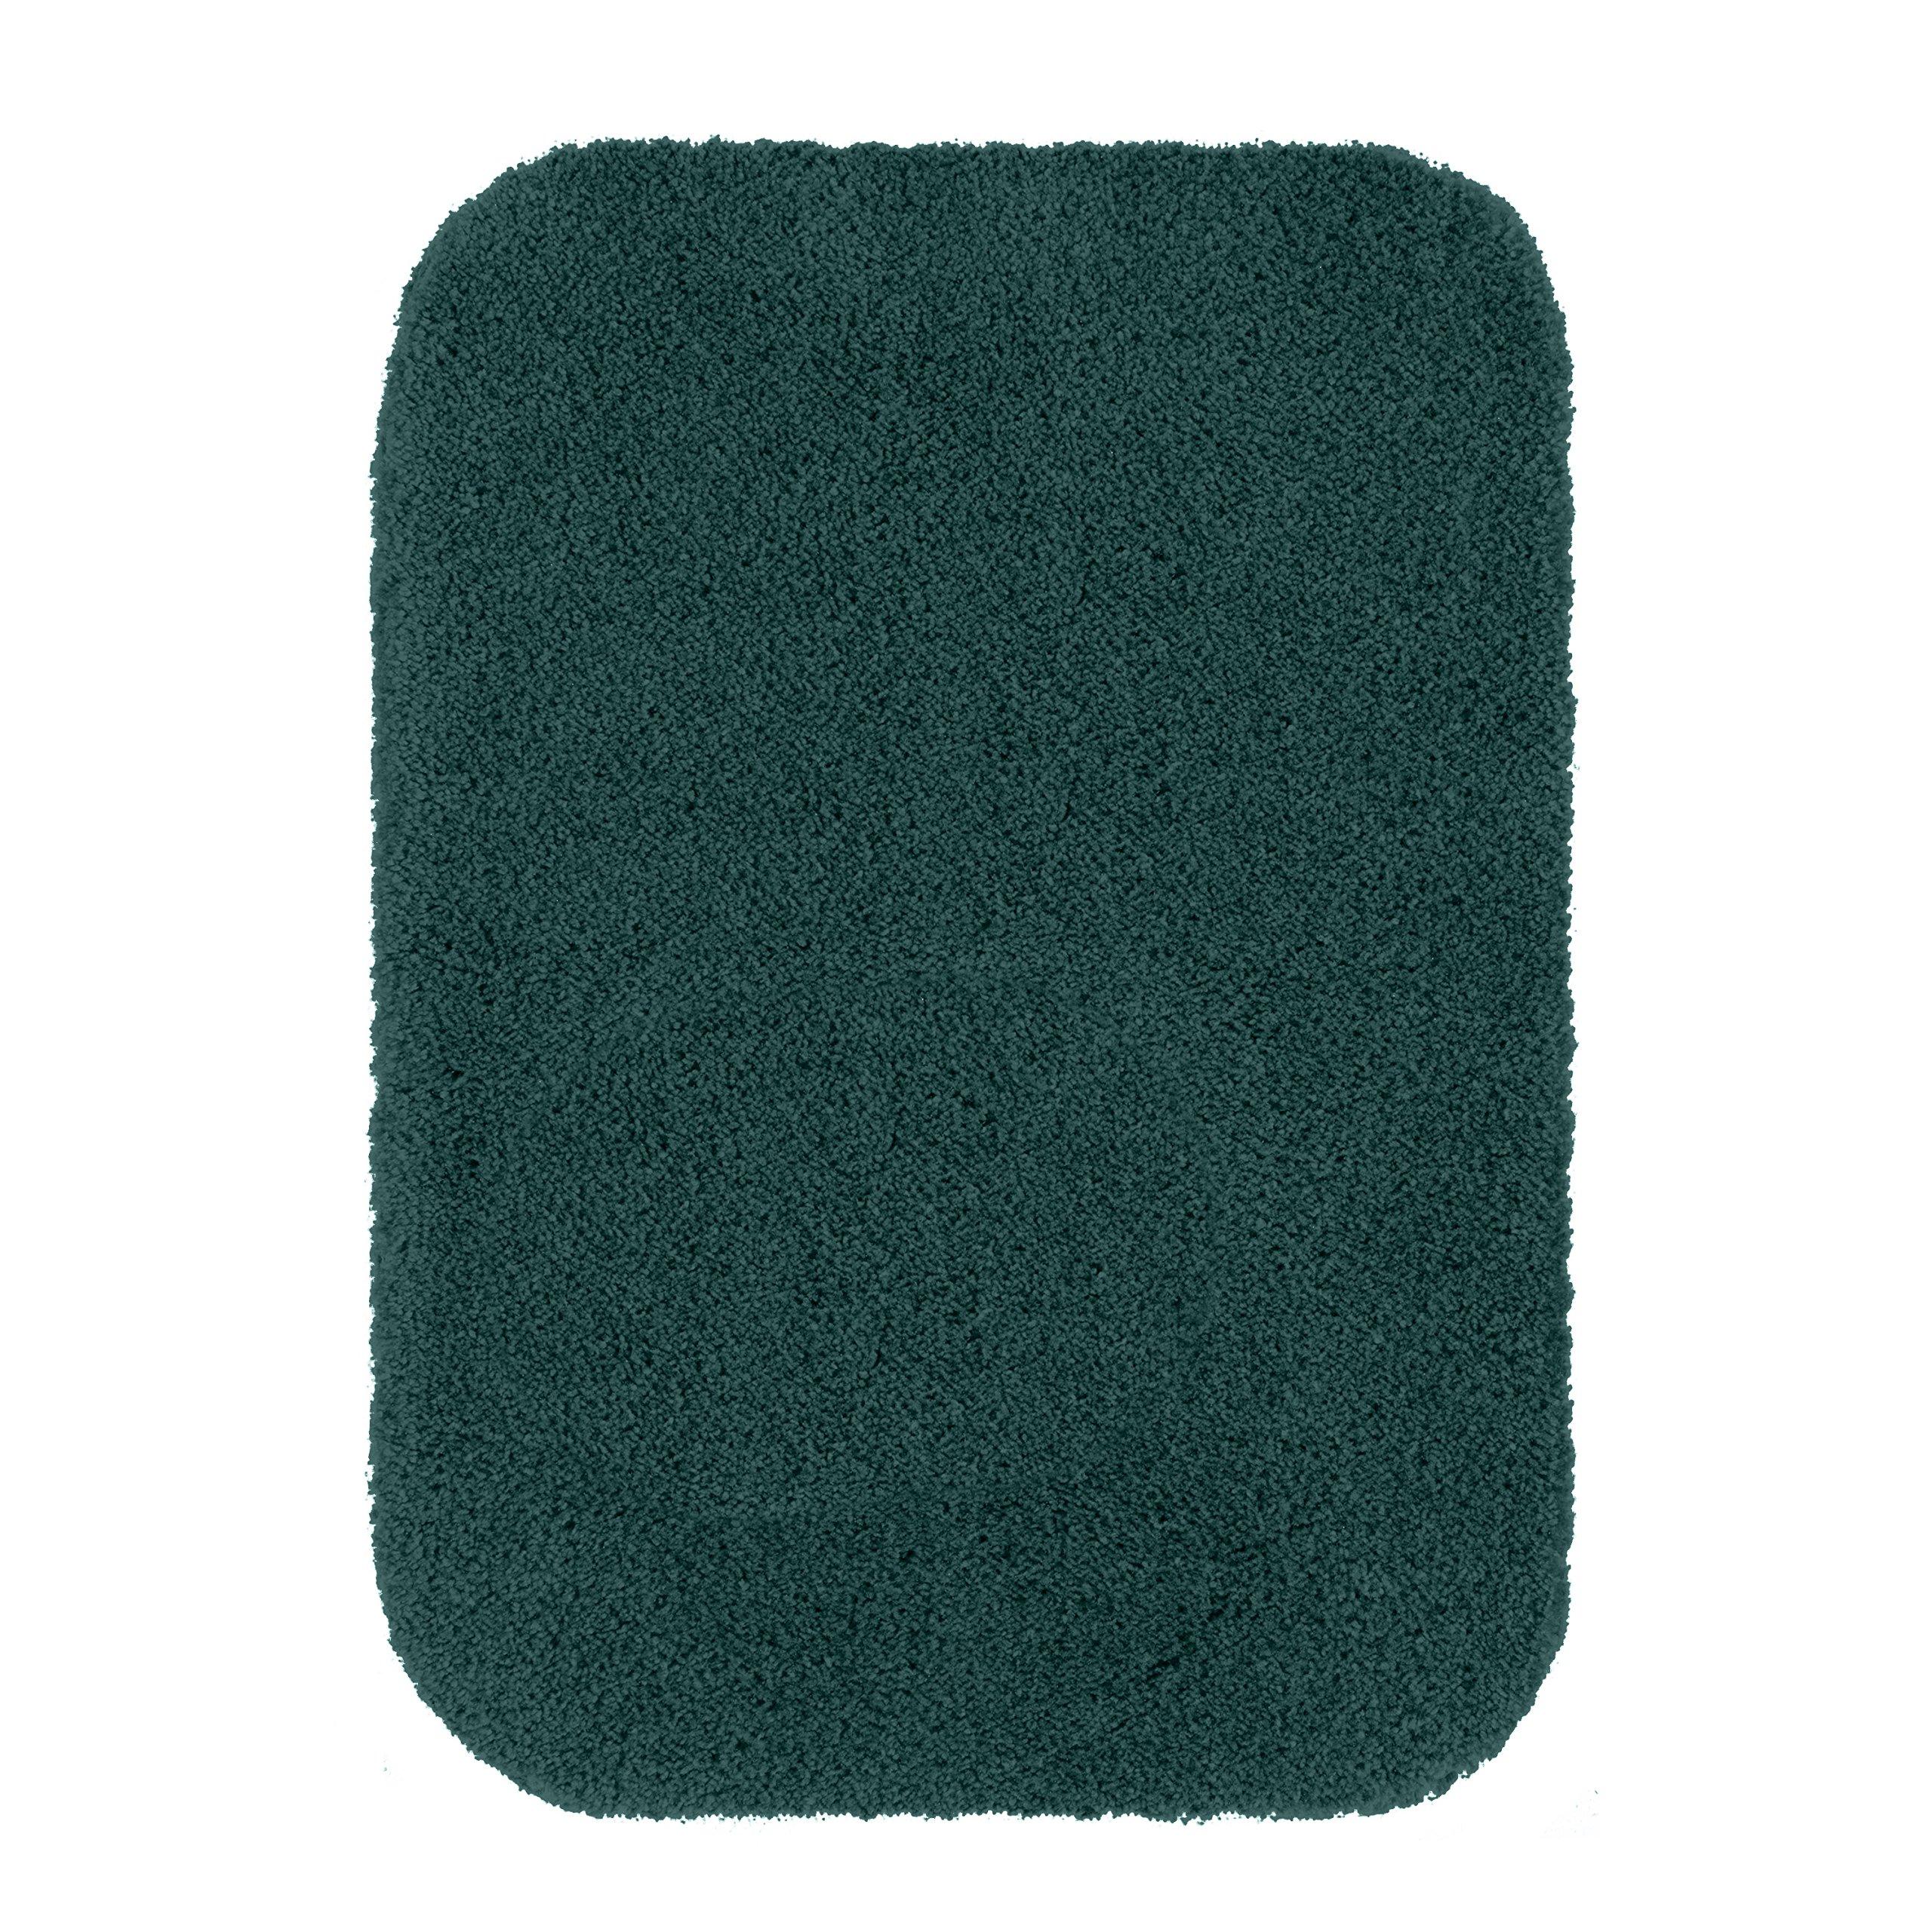 Maples Rugs Bathroom Rugs - Cloud Bath 17'' x 24'' Washable Non Slip Bath Mat [Made in USA] for Kitchen, Shower, and Bathroom, Teal Quartz